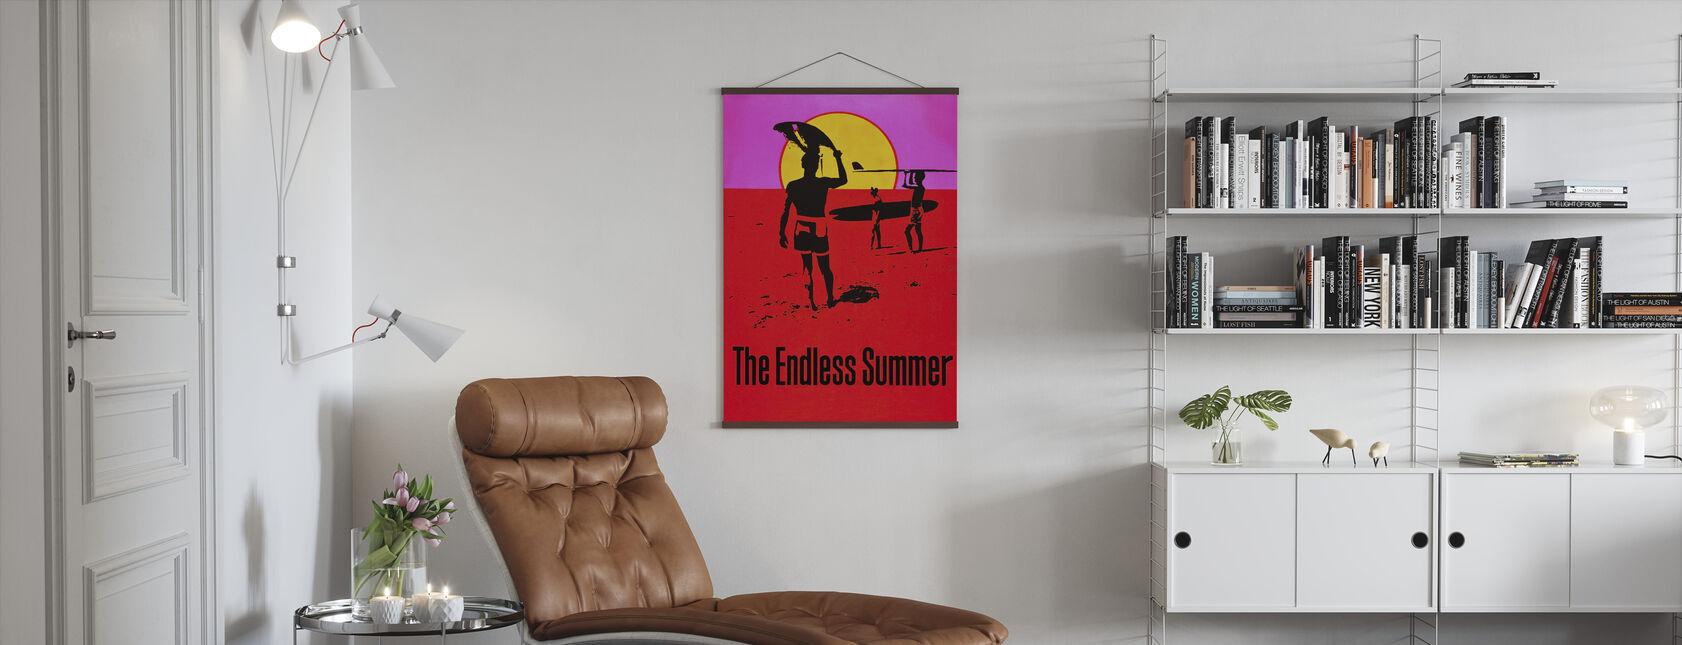 Endless Summer - Poster - Living Room